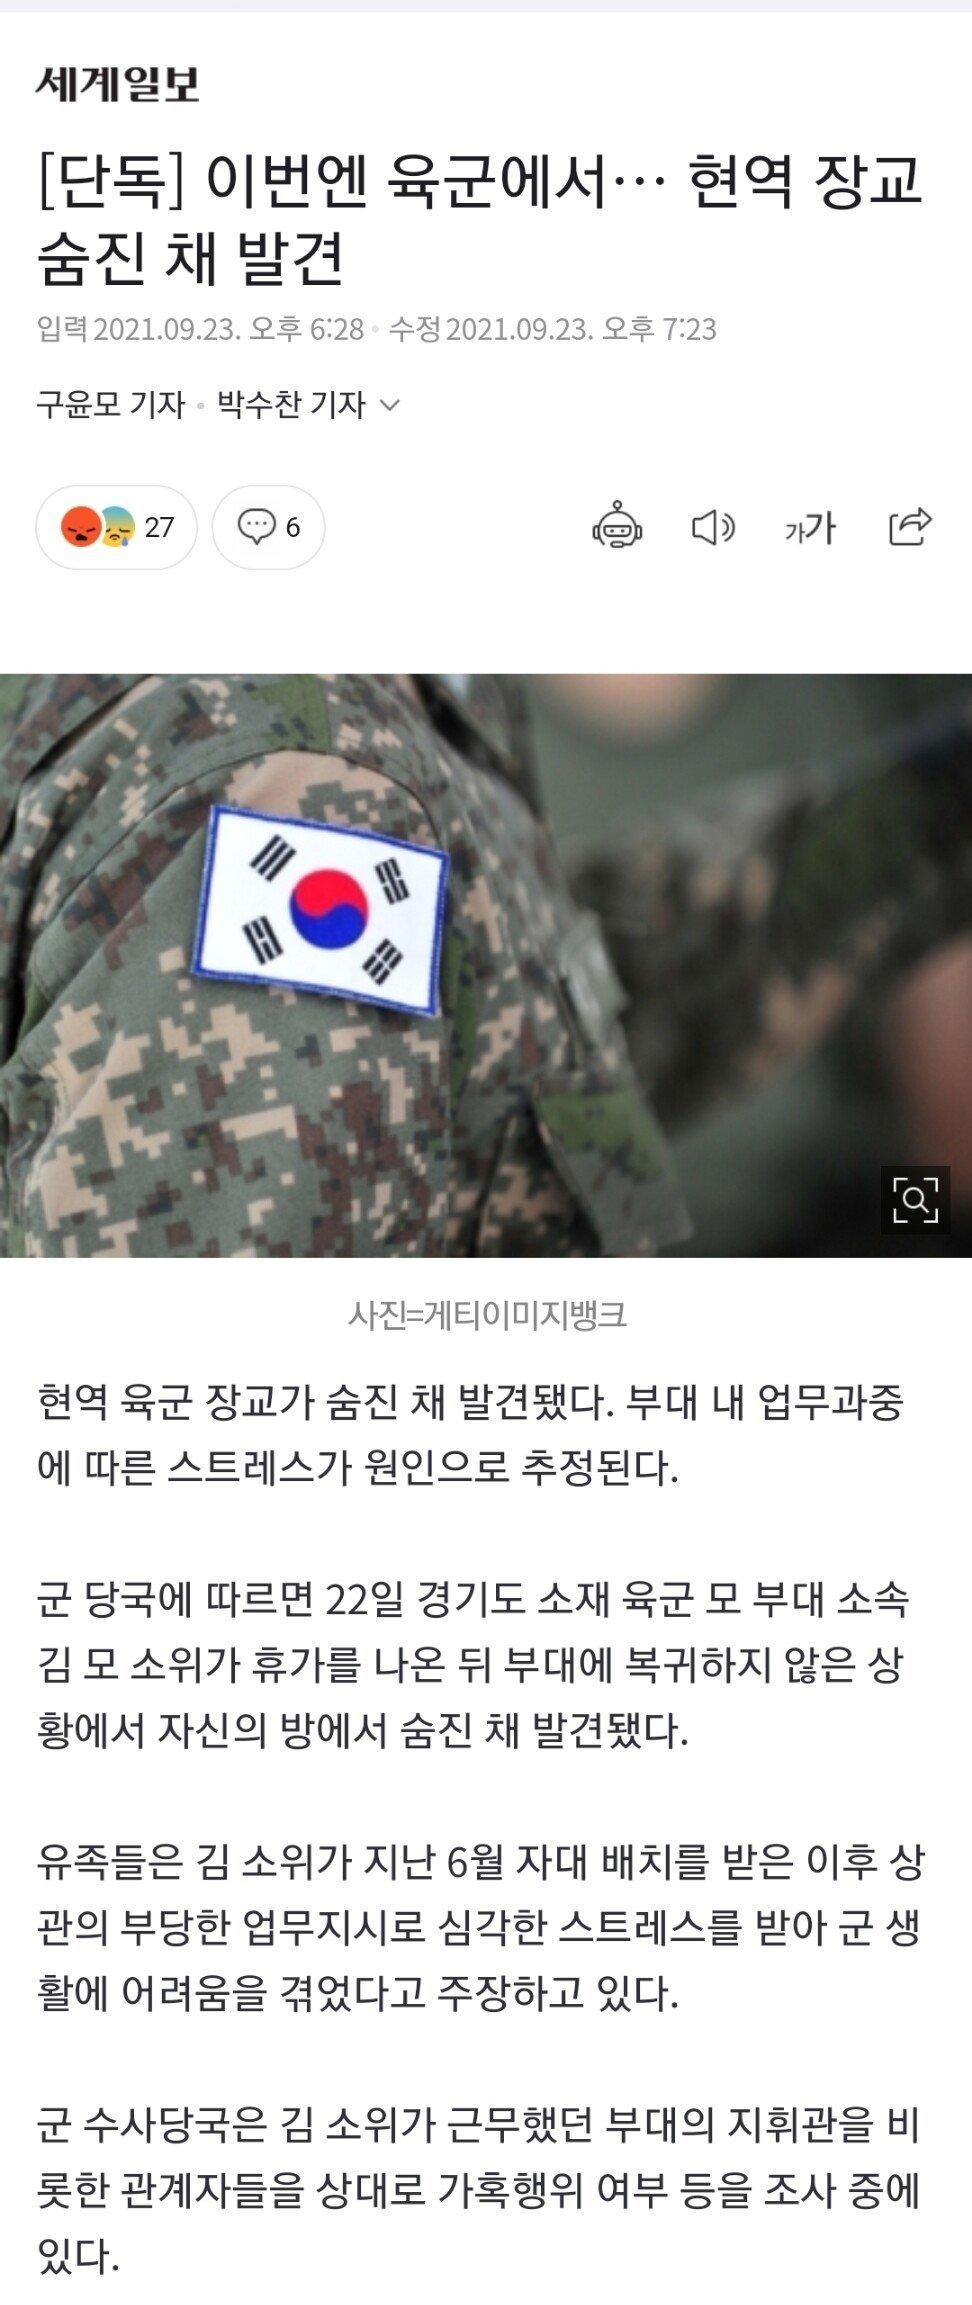 Screenshot_20210923-194451_Samsung Internet.jpg [단독] 이번엔 육군에서… 현역 장교 숨진 채 발견